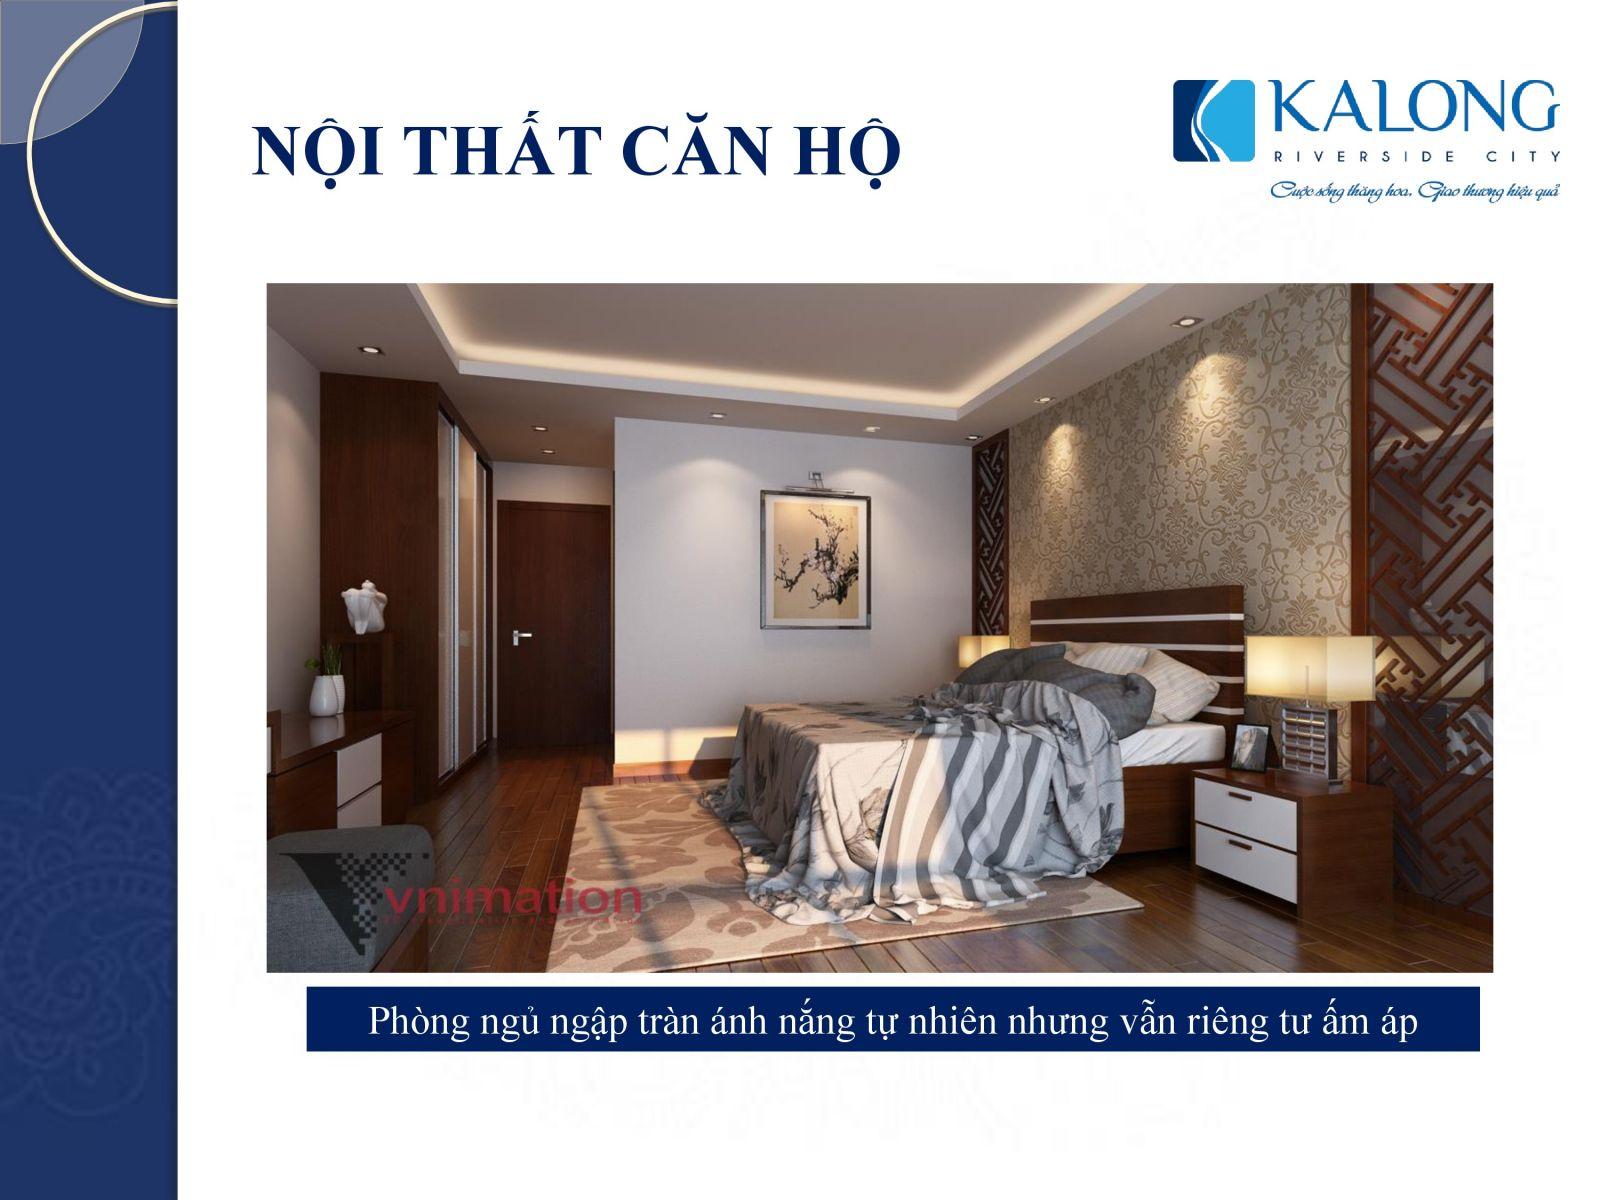 kalong riverside nội thất cao cấp